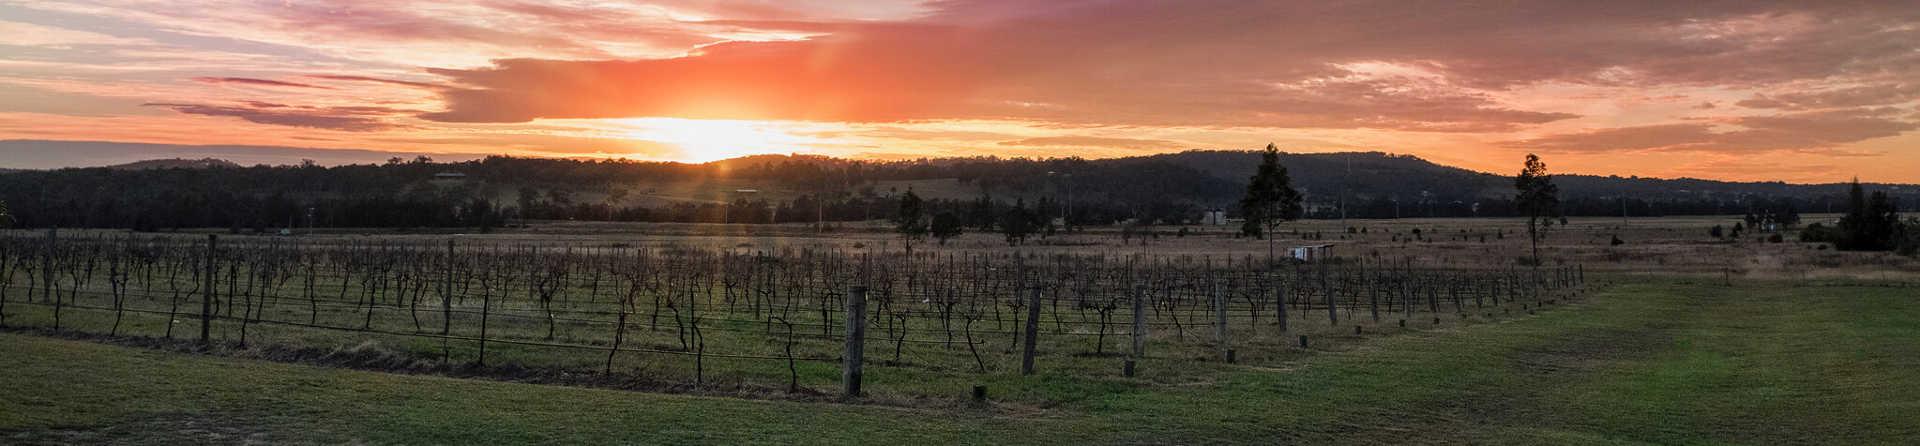 Is wine tasting free in Hunter Valley?